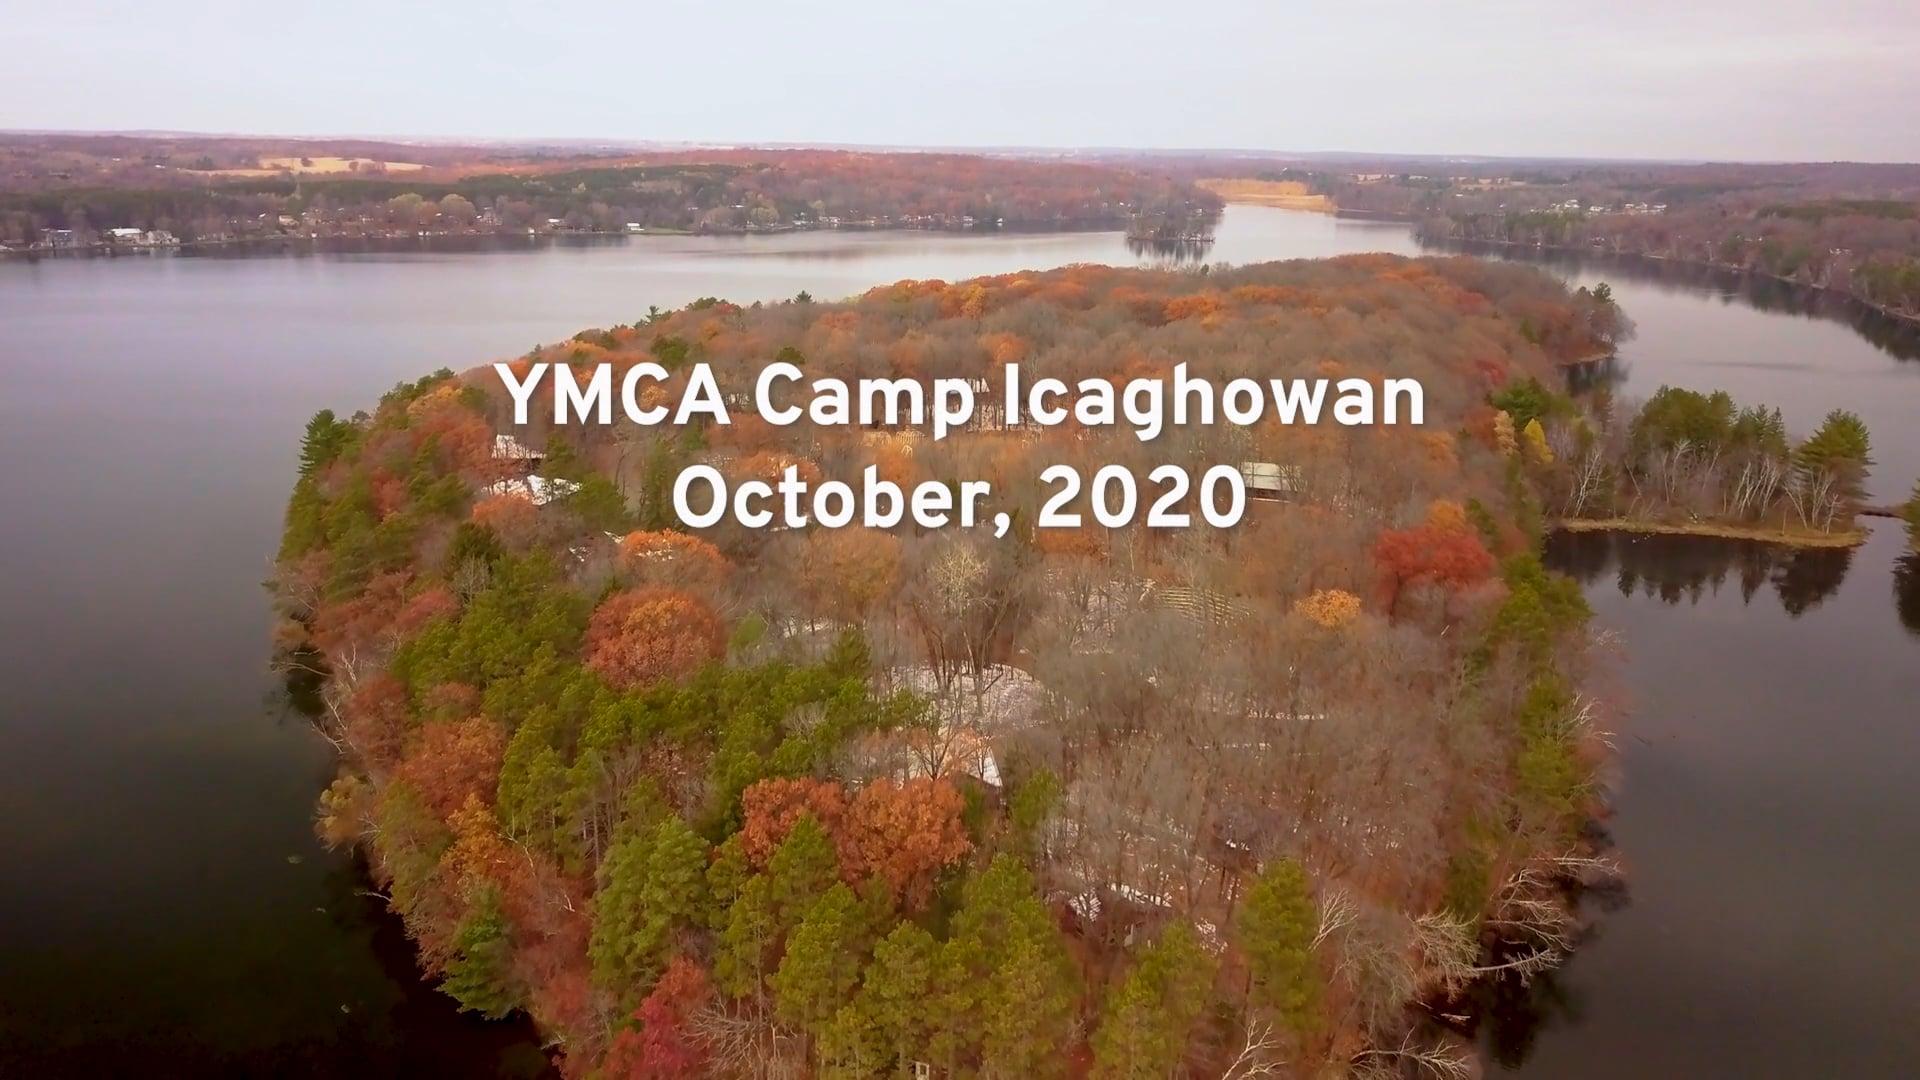 YMCA Camp Icaghowan